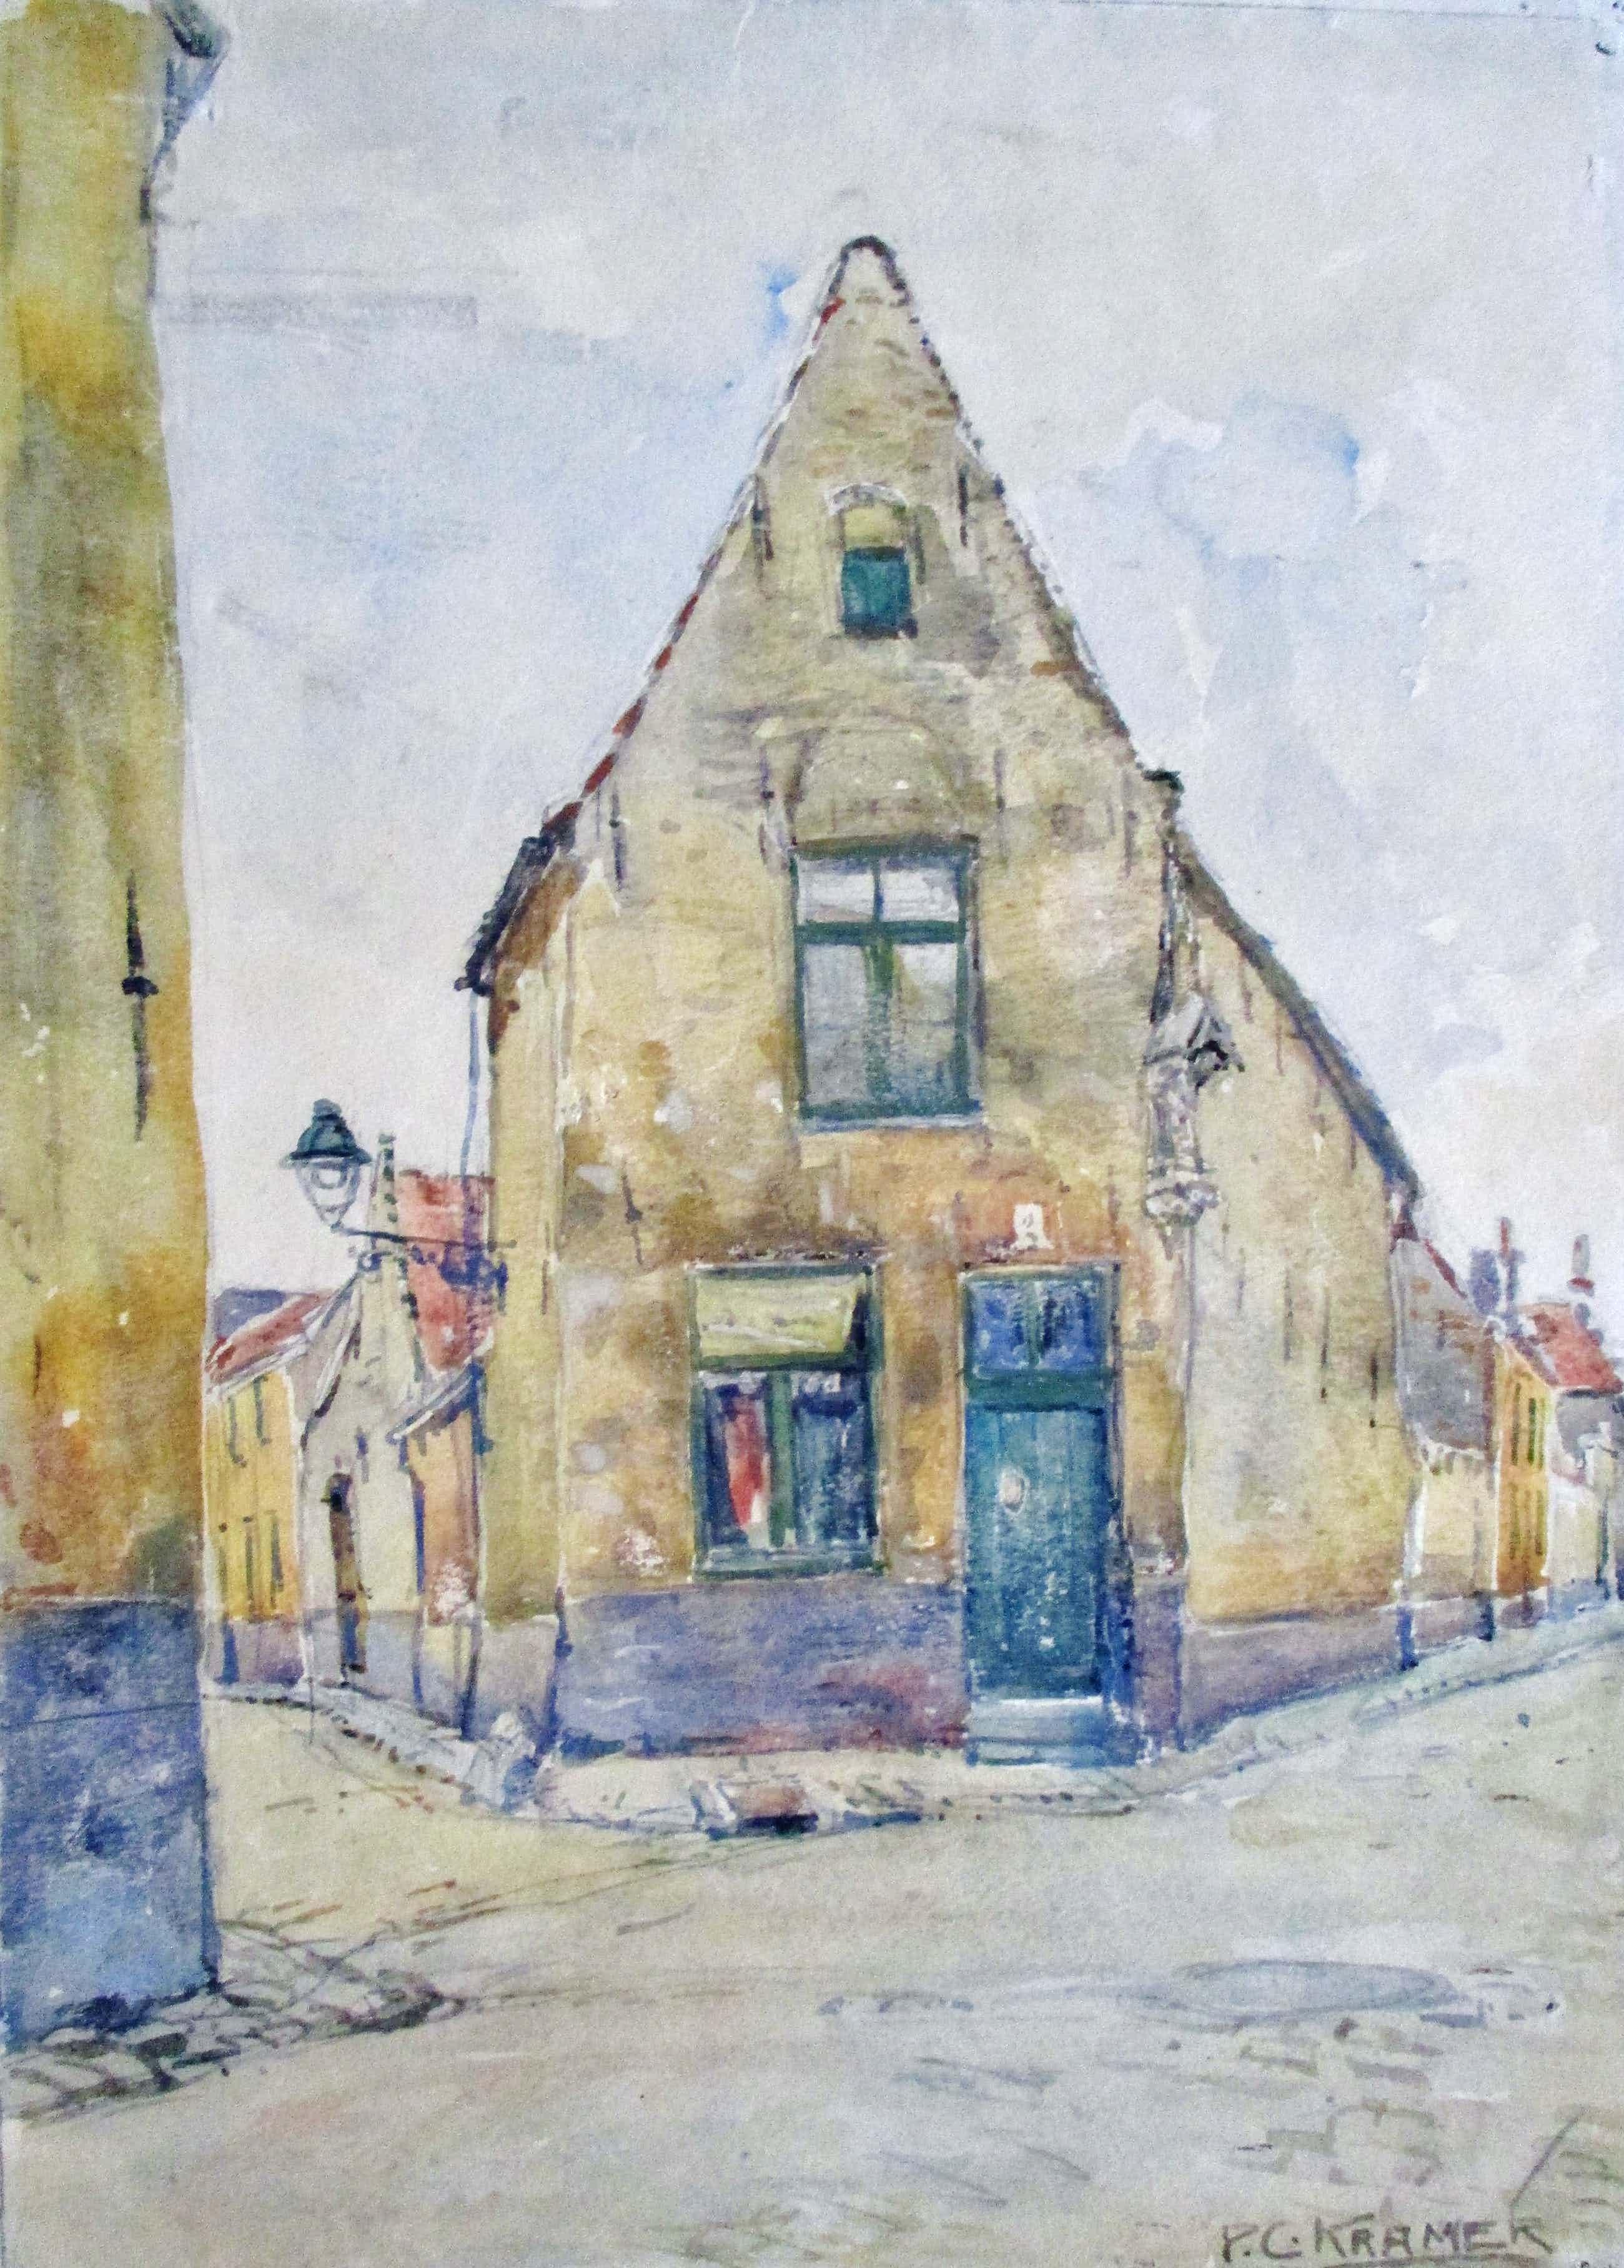 Piet Kramer - Aquarel stadsgezicht kopen? Bied vanaf 30!